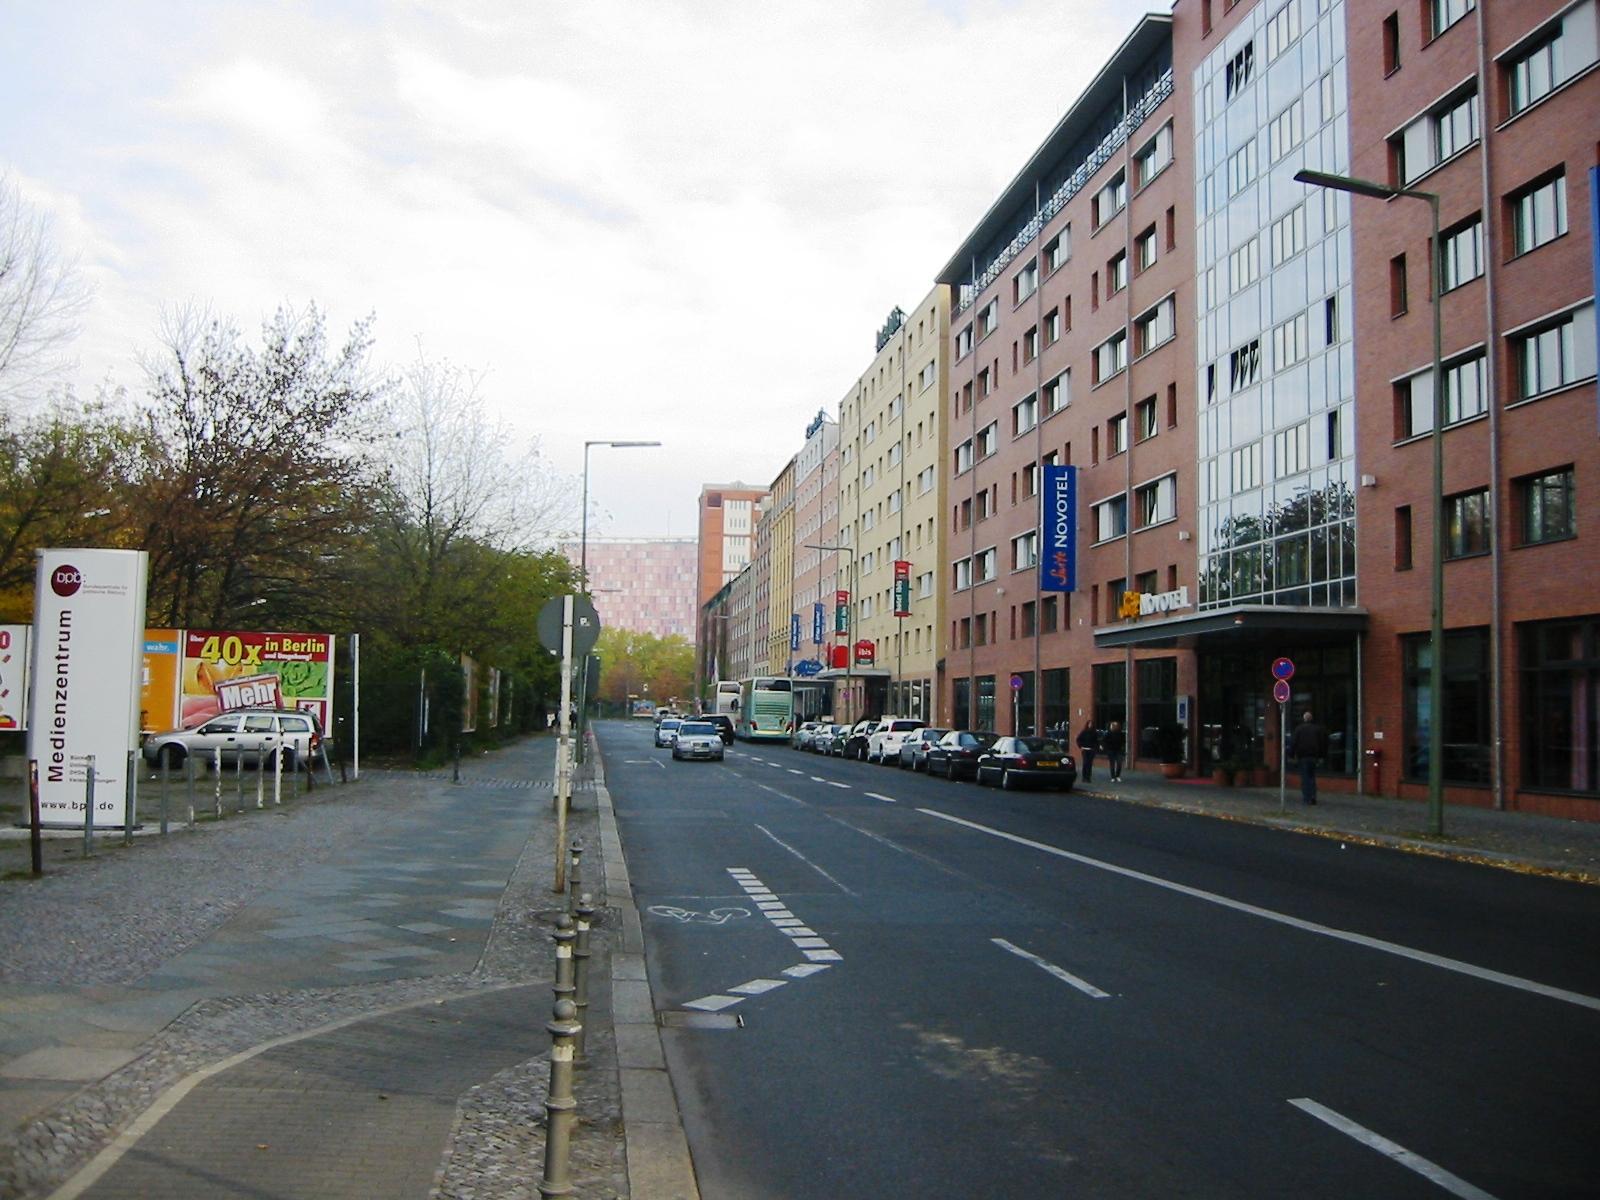 Anhalter Stra Ef Bf Bde Berlin Hotel